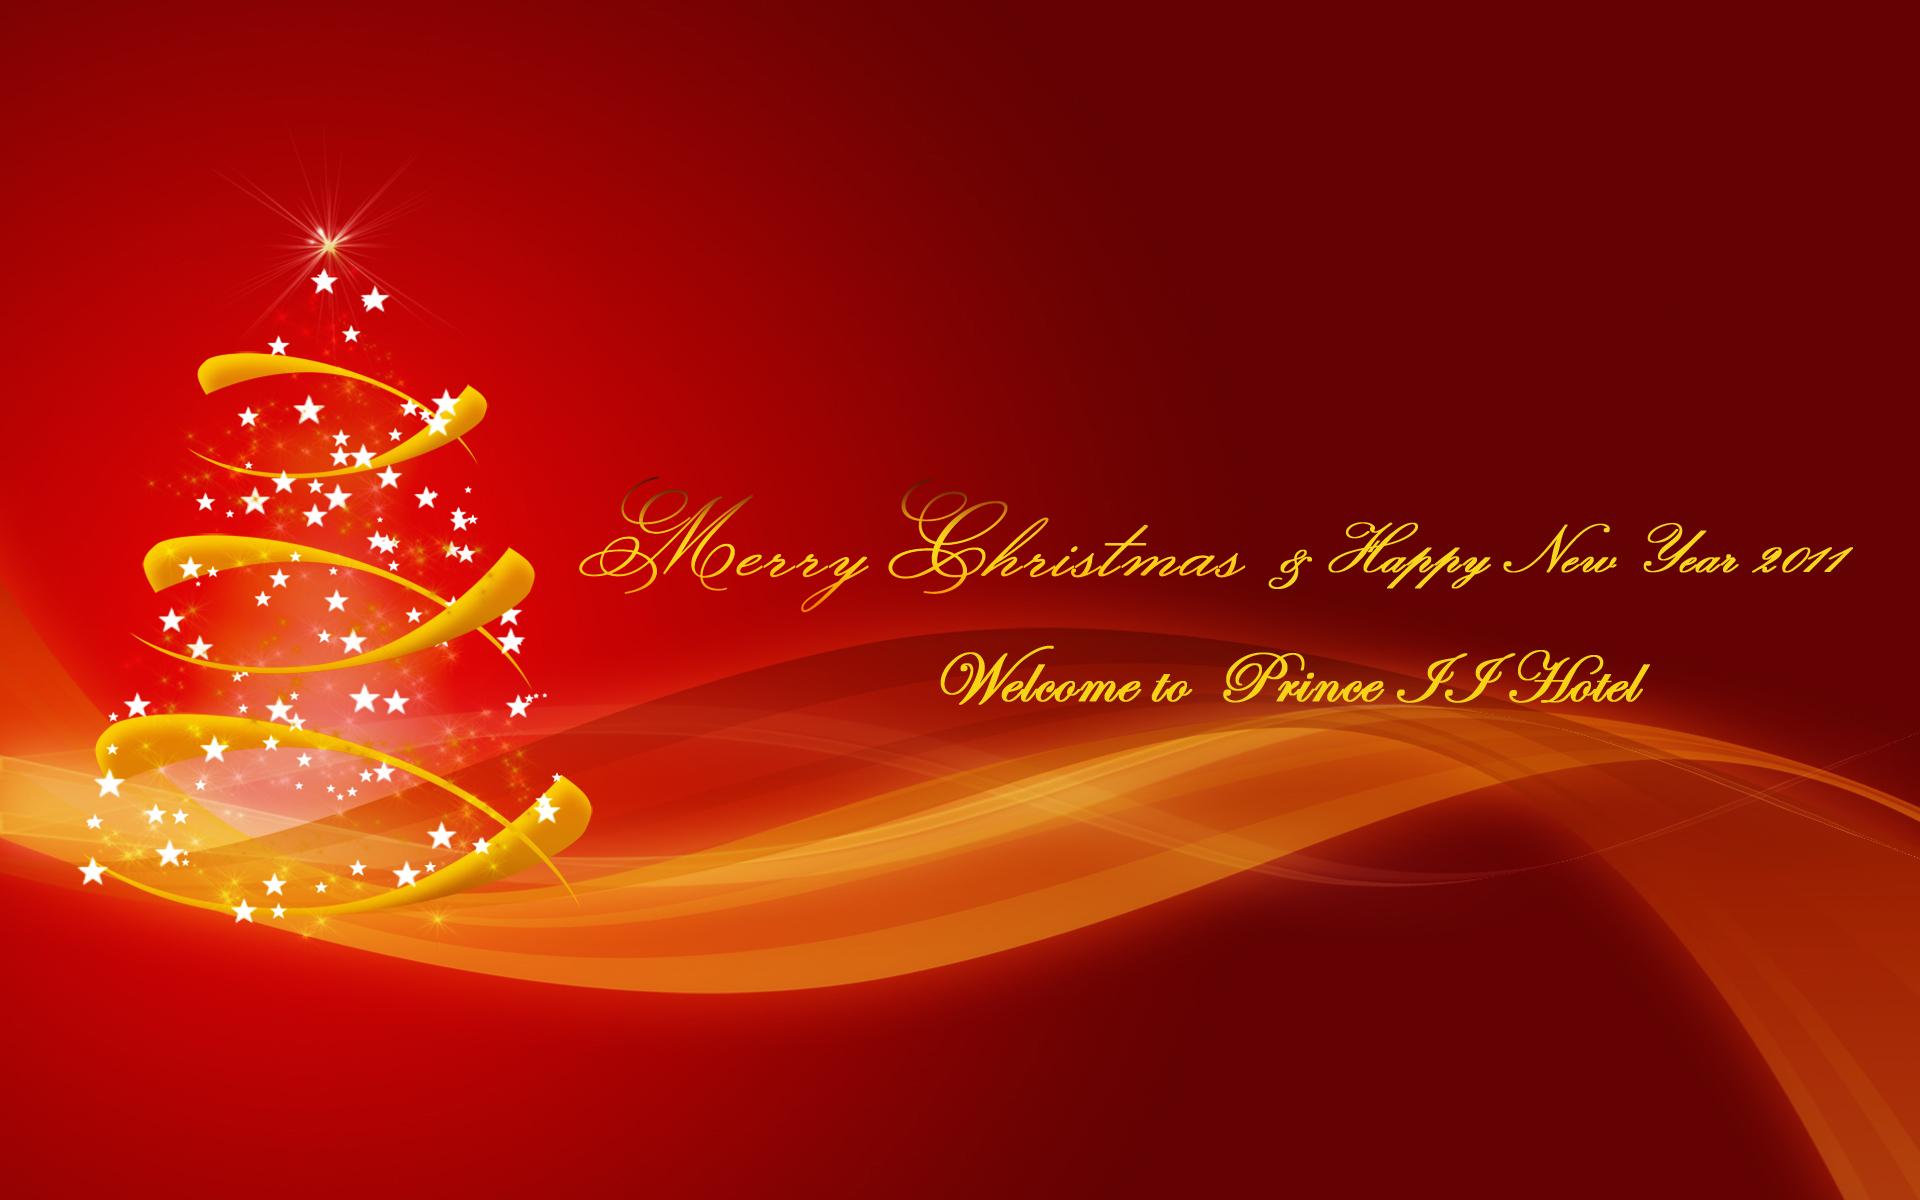 merry christmas and happy new year 2011 christmas prince ii jpg